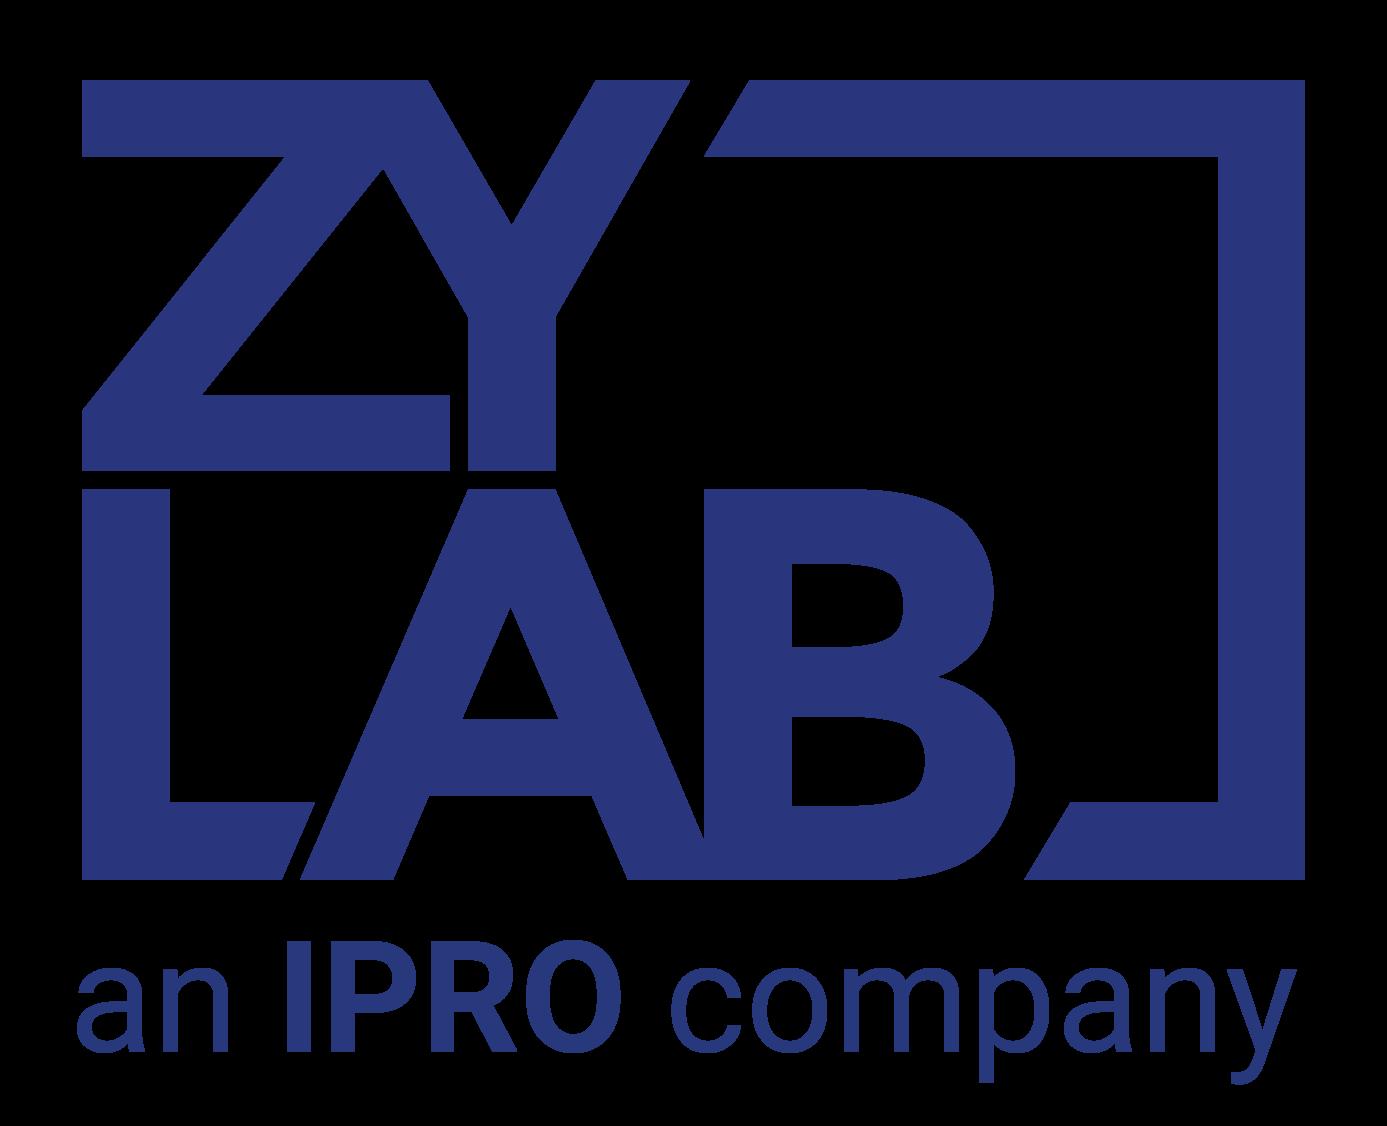 L-ZyLAB-DIAP-IPRO-Bold-1